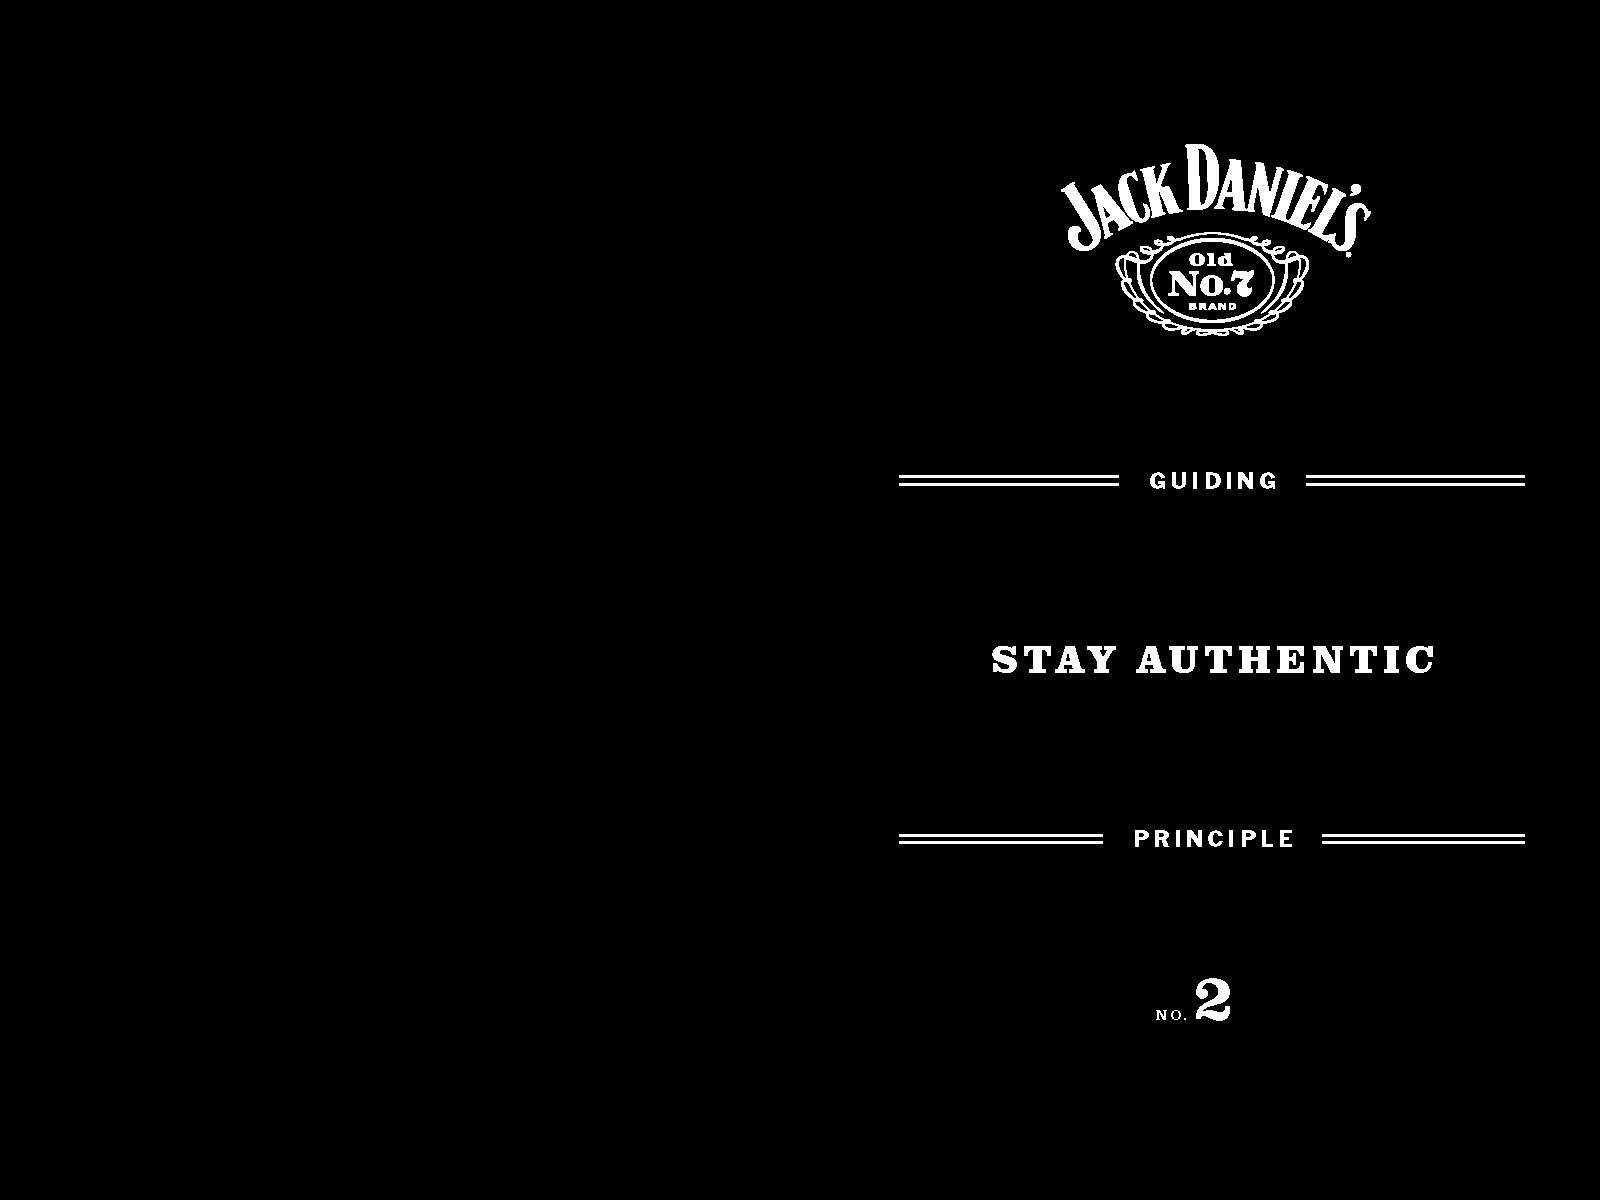 Jack Daniel's Guiding Principles 2012_Page_13.jpg